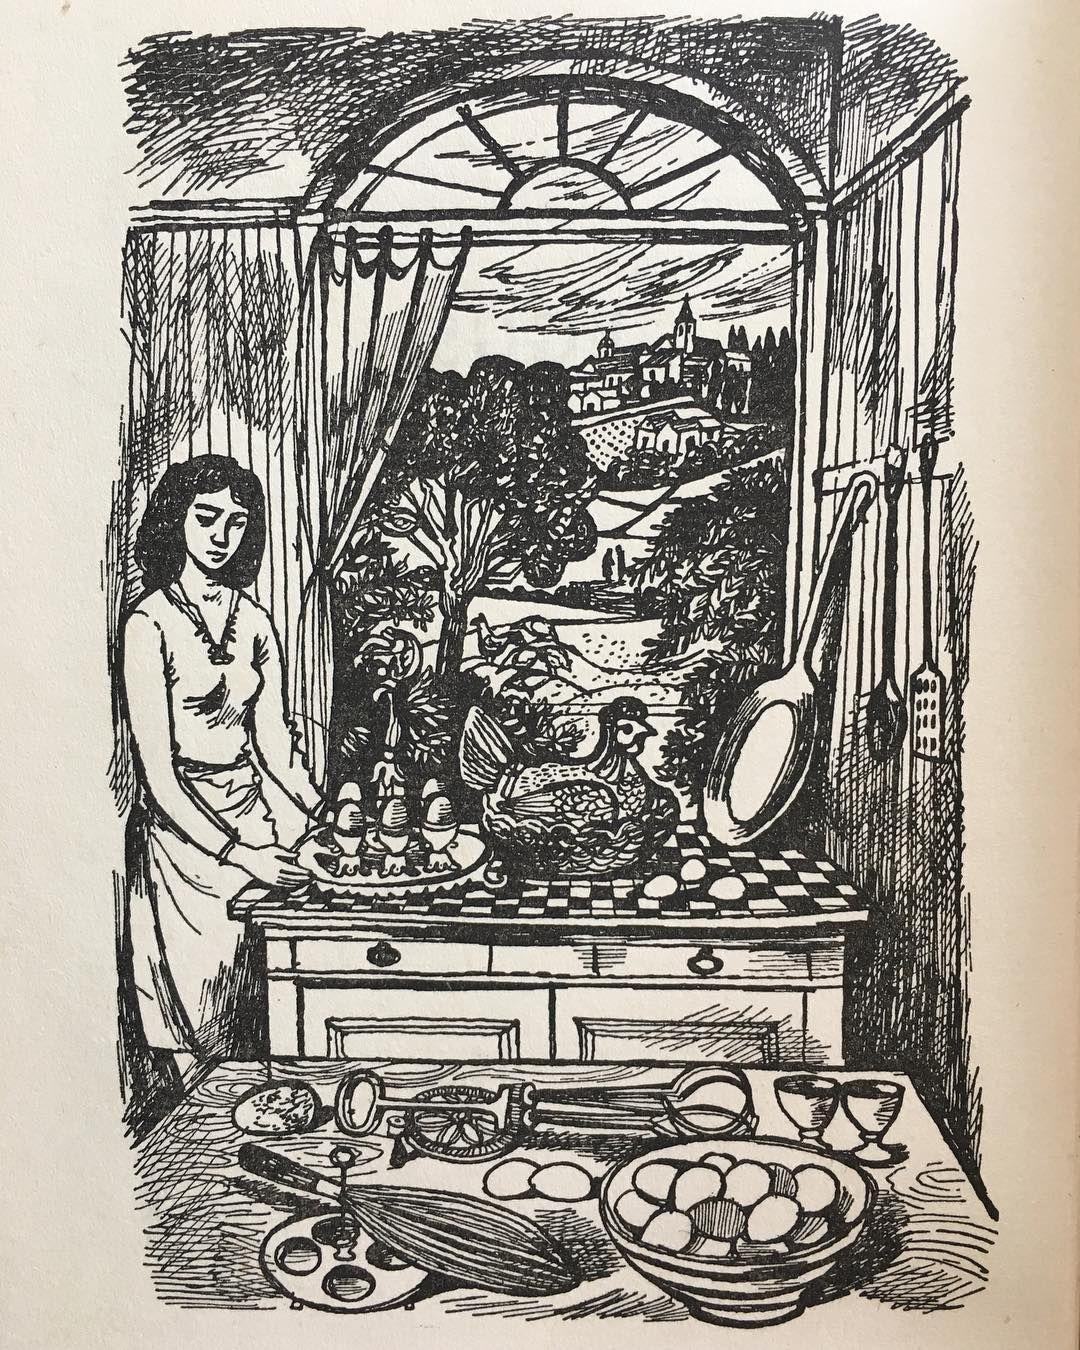 John Minton Illustration From Elizabeth David's 'French